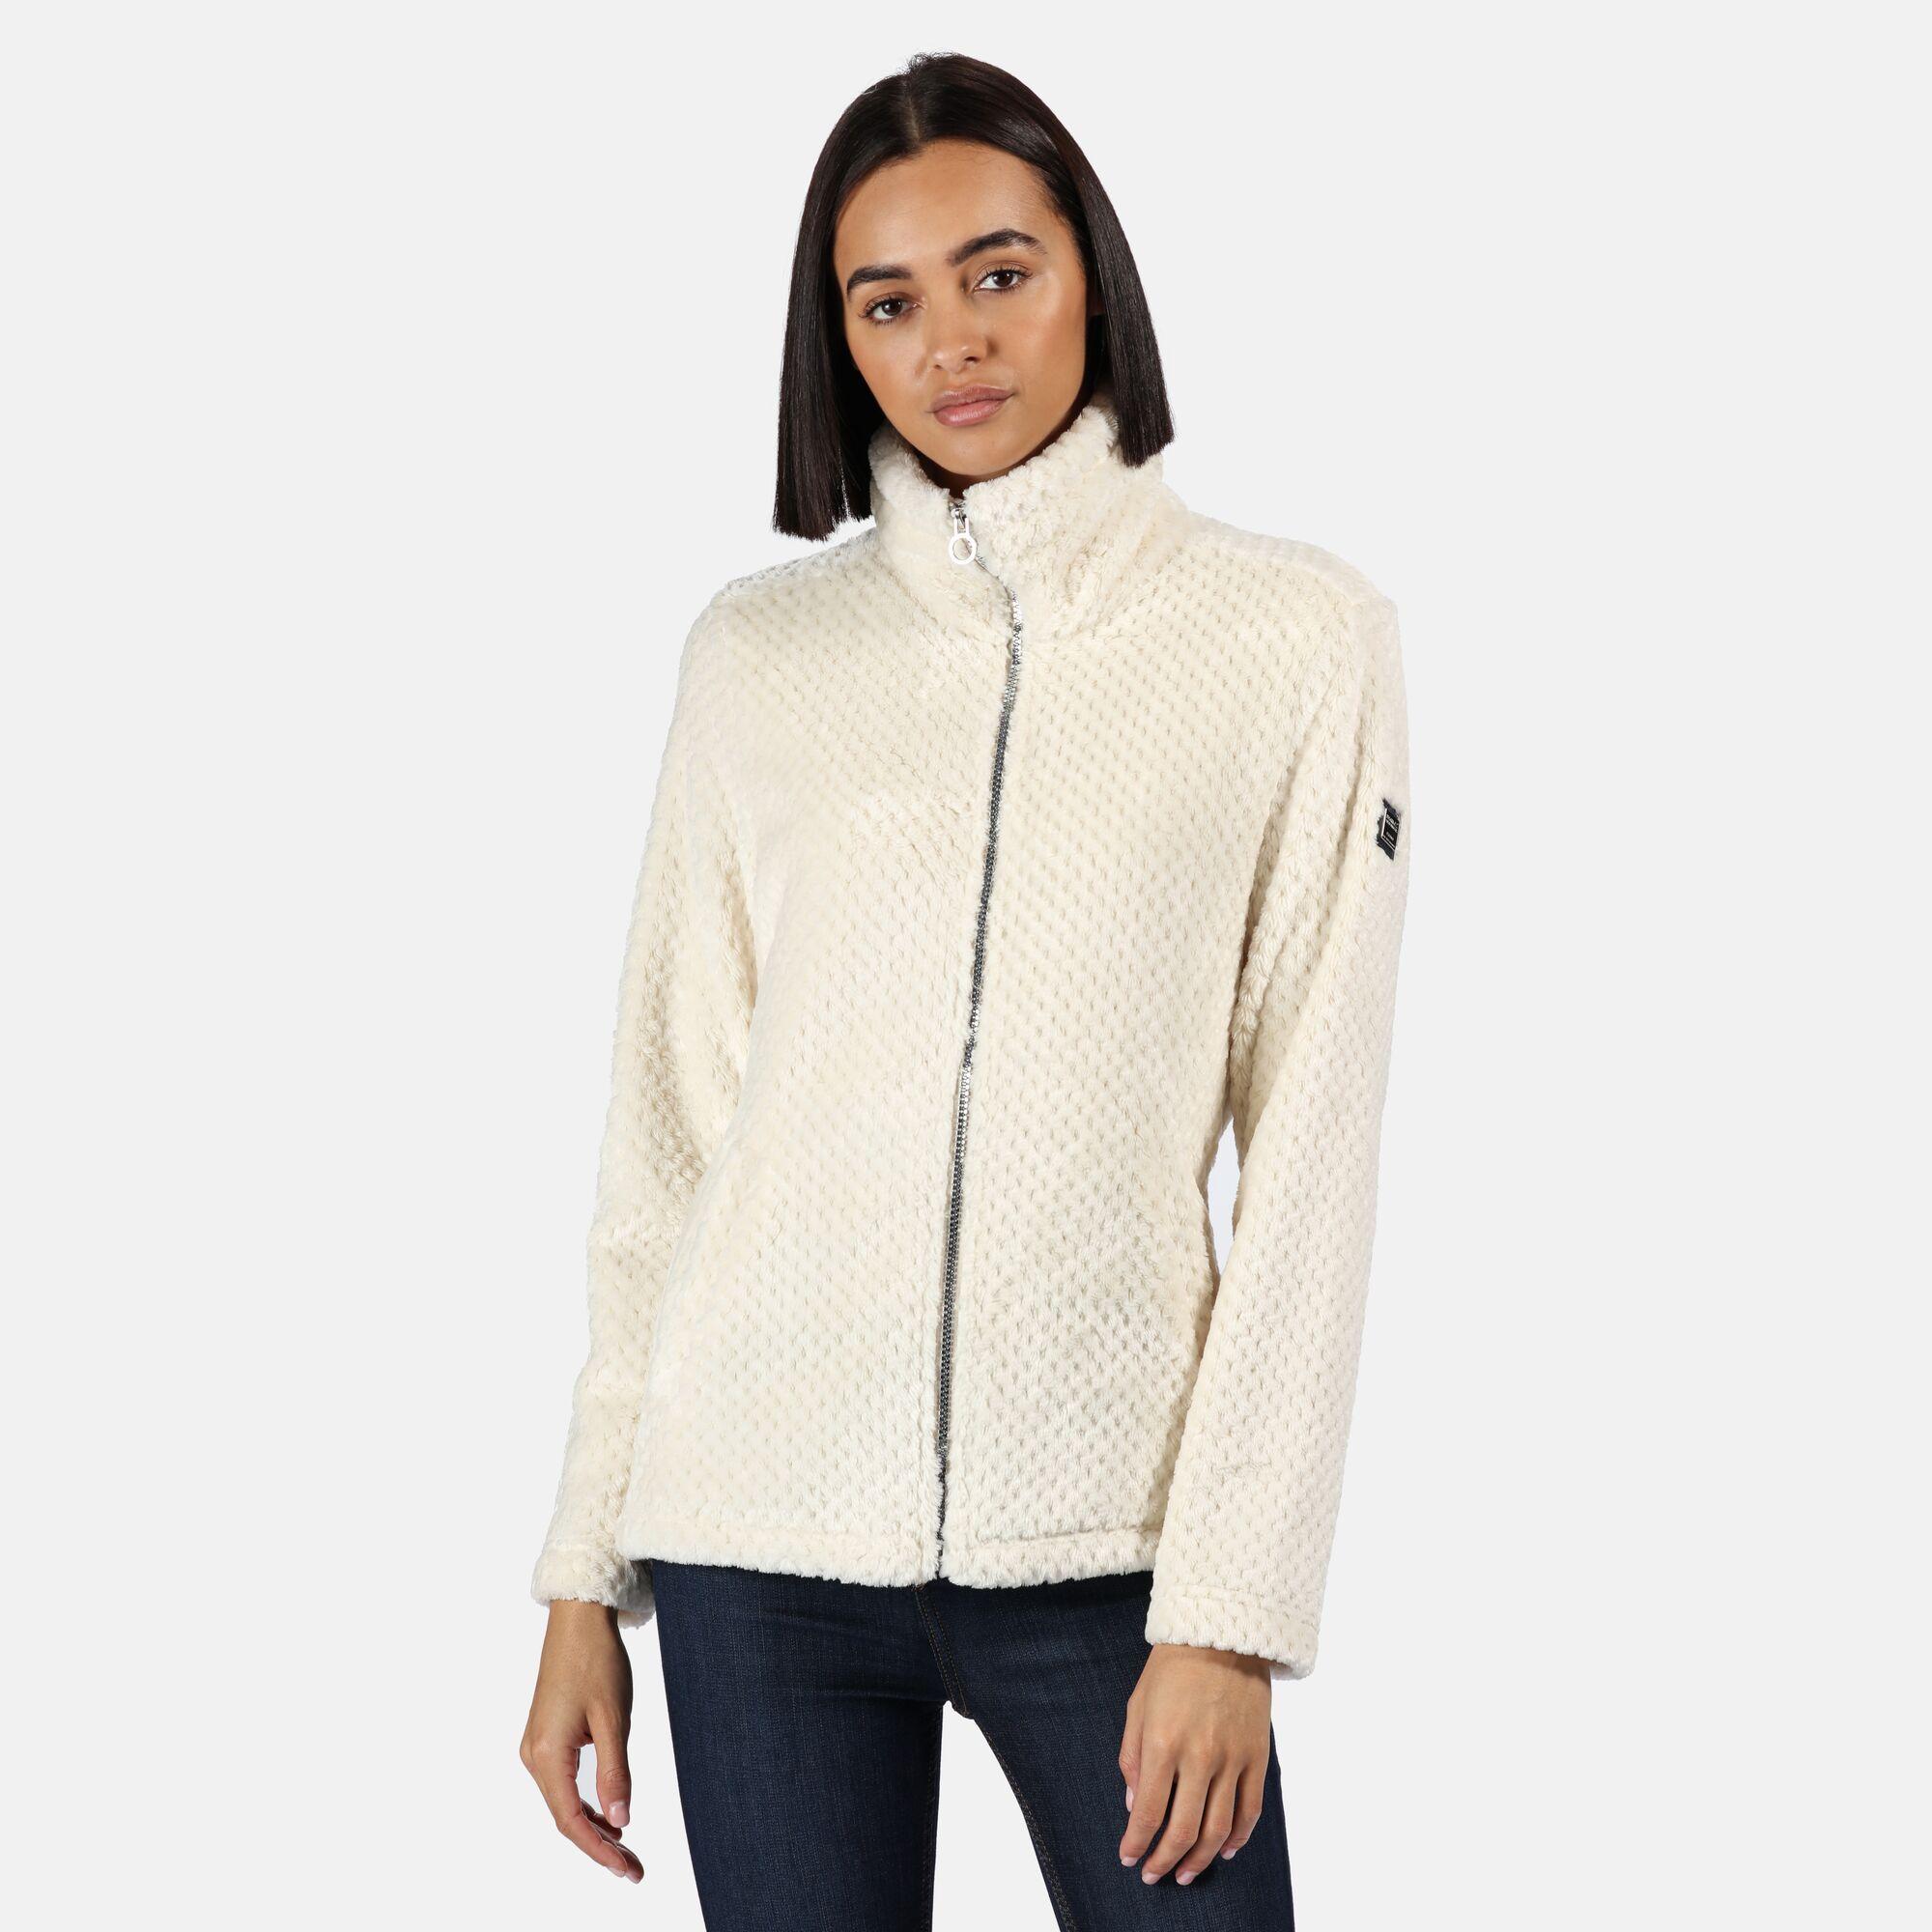 Regatta Womens//Ladies Hermilla Velour Full Zip Fleece RG5326